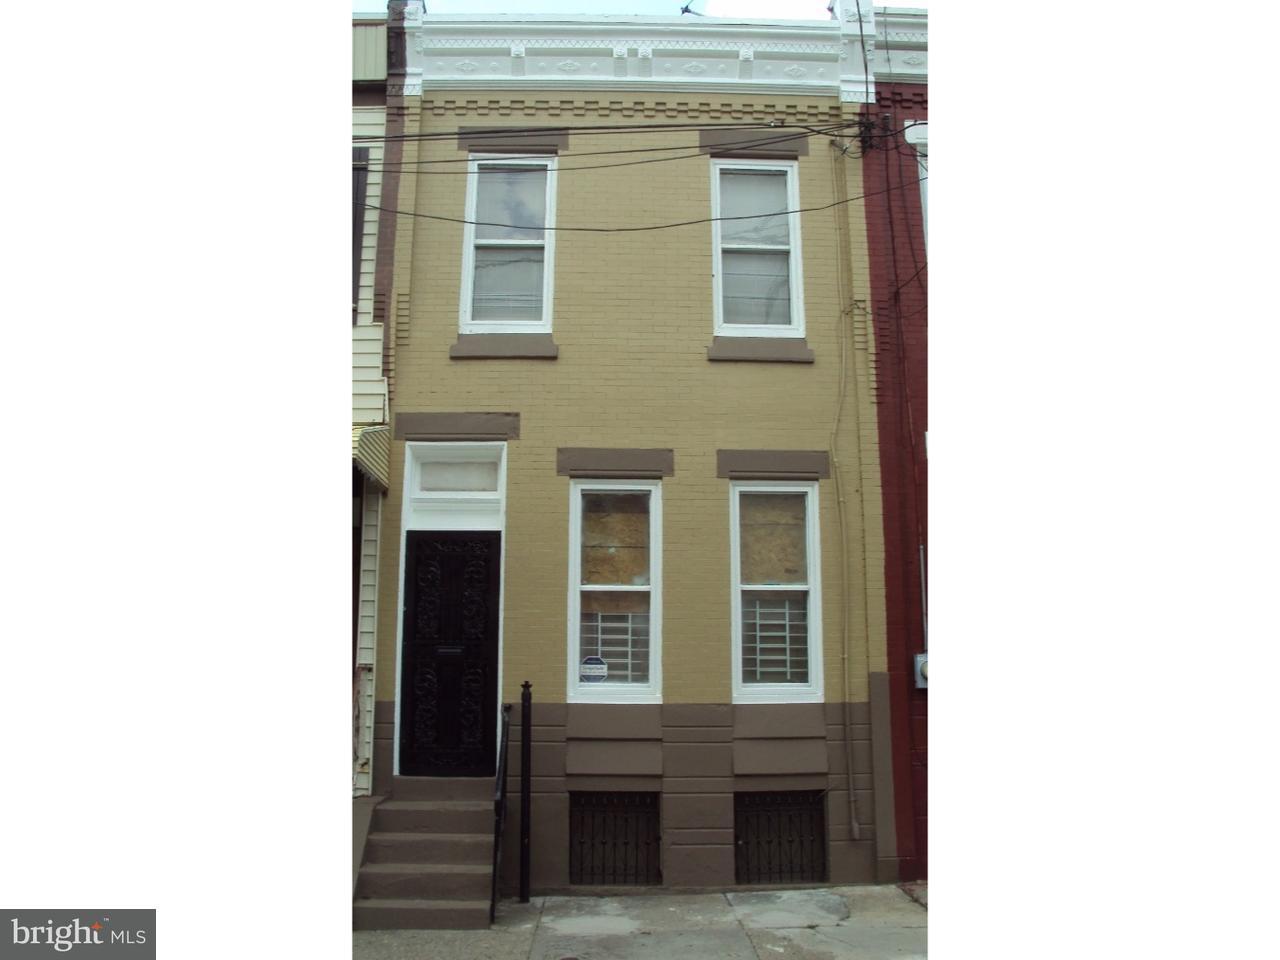 2448 N Opal Philadelphia, PA 19132